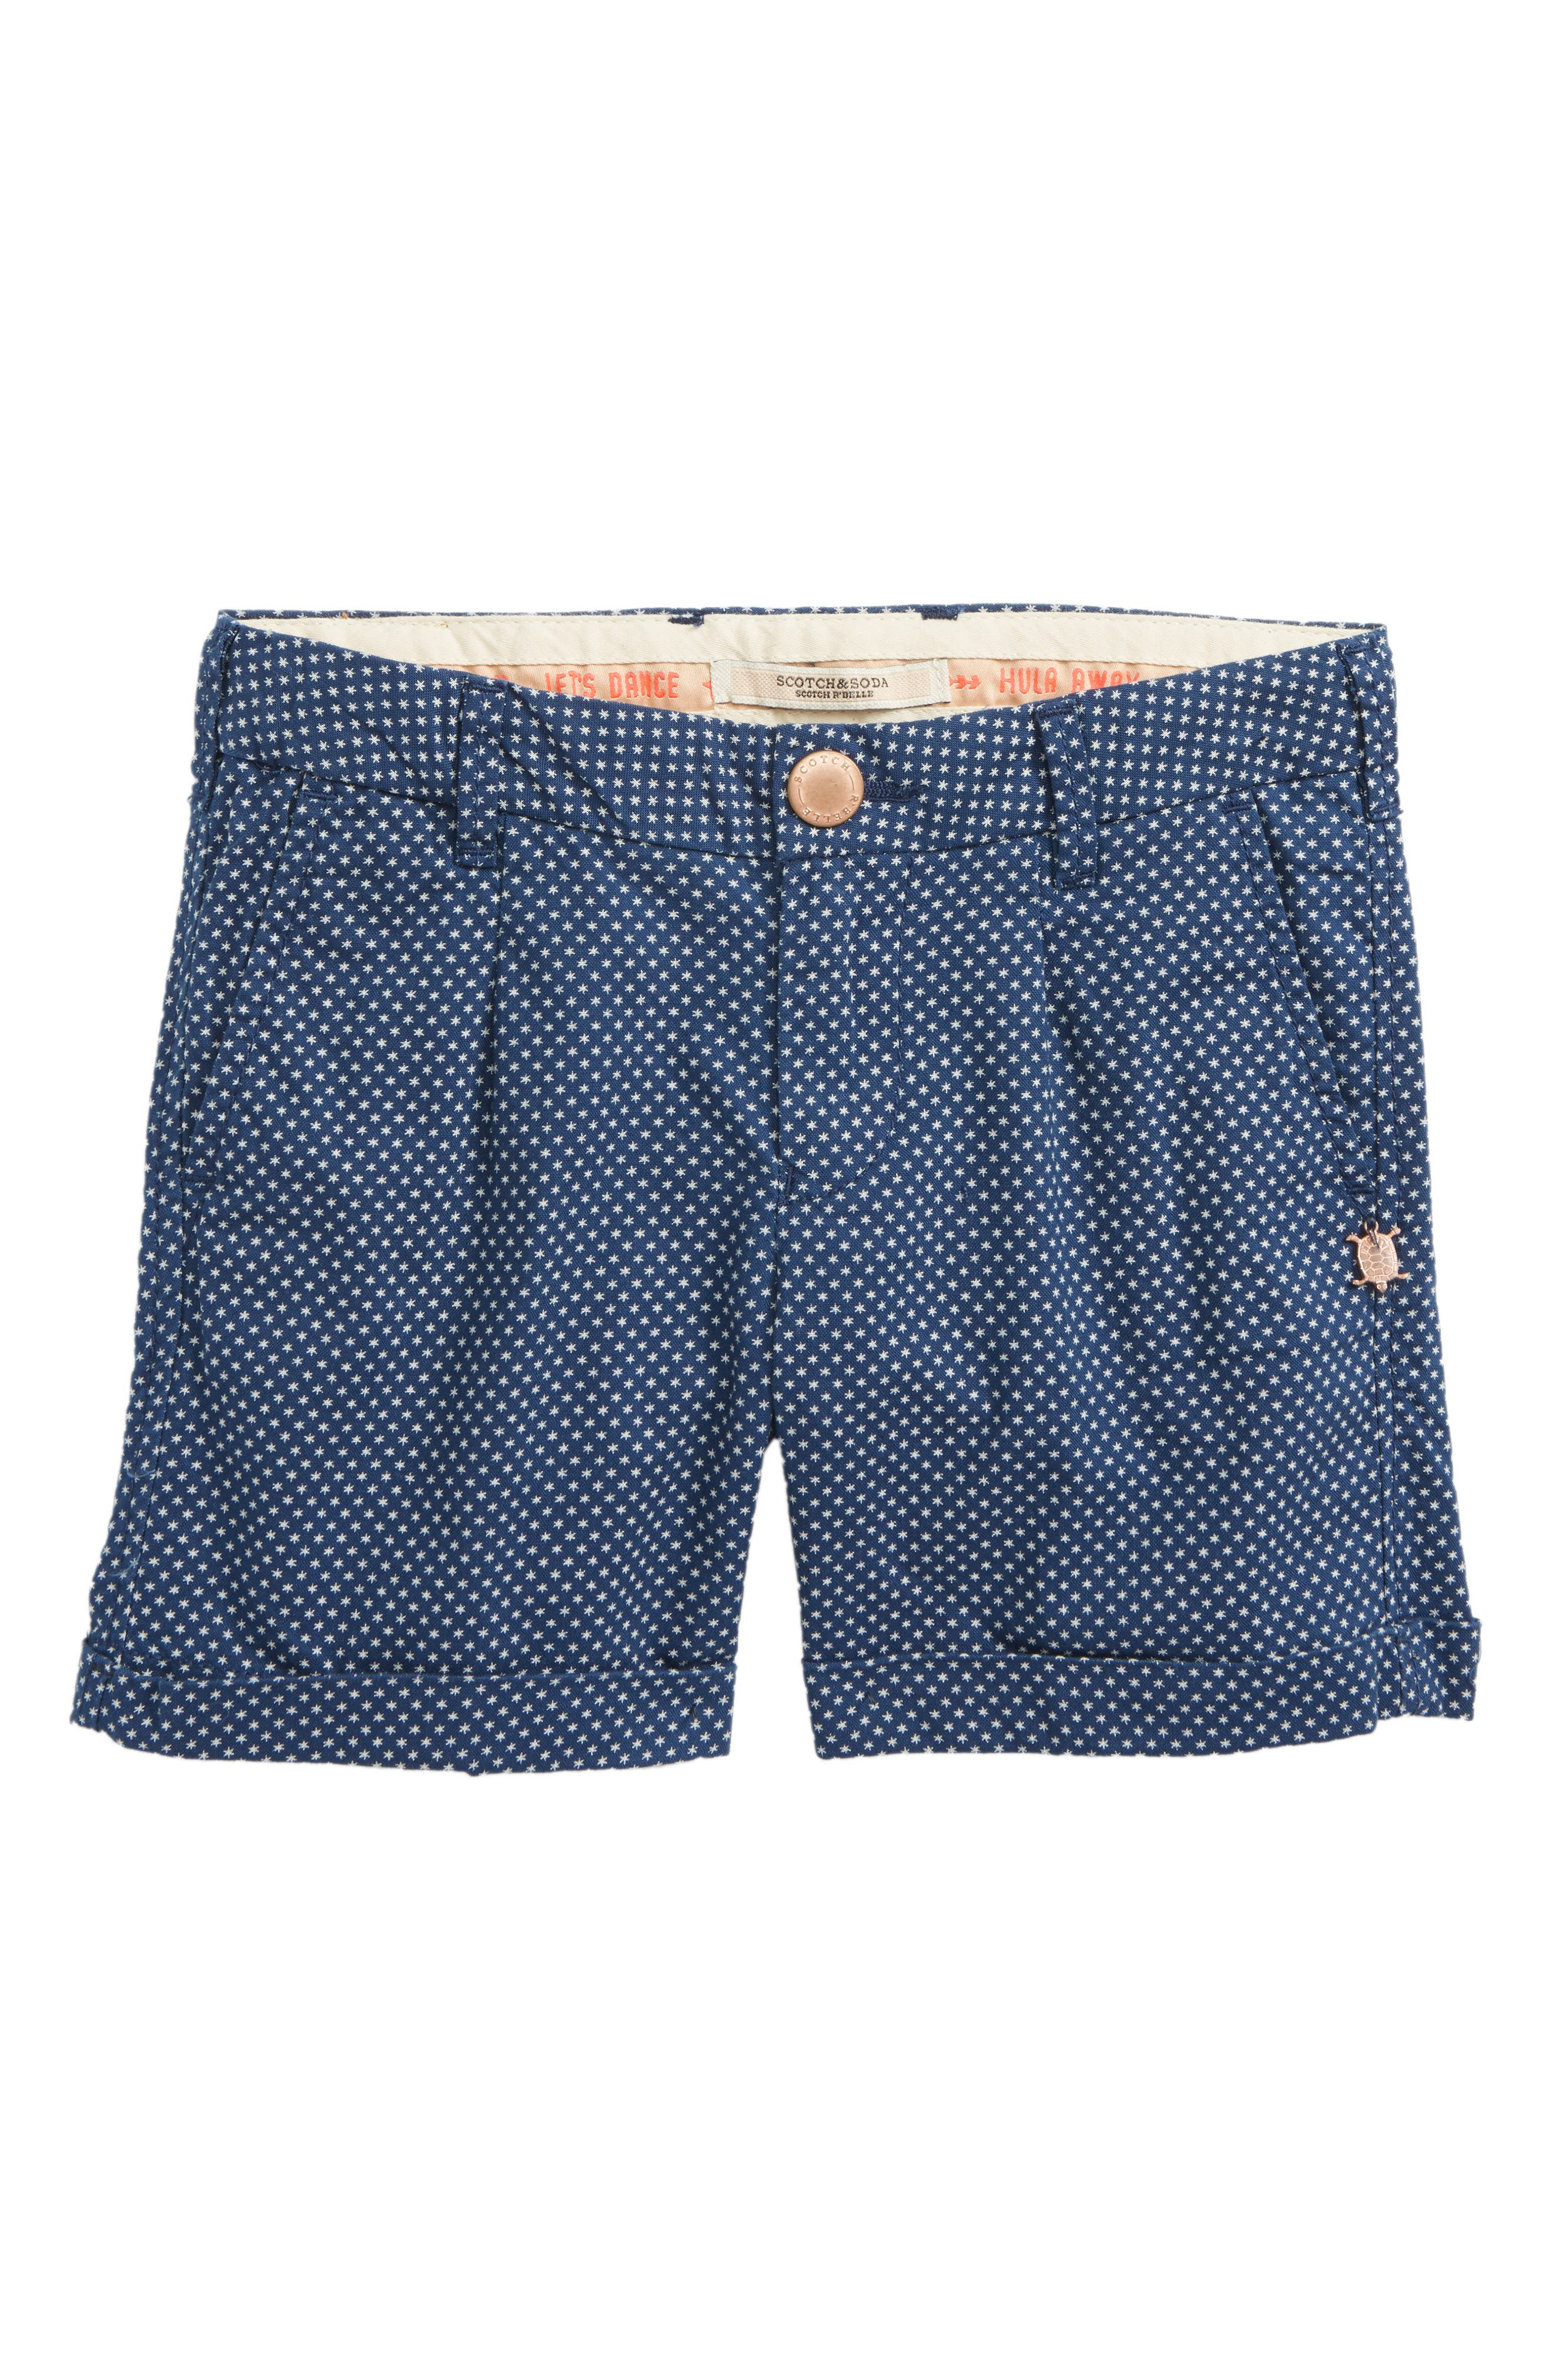 Scotch R'Belle Star Cotton Shorts,                             Main thumbnail 1, color,                             217 A Print